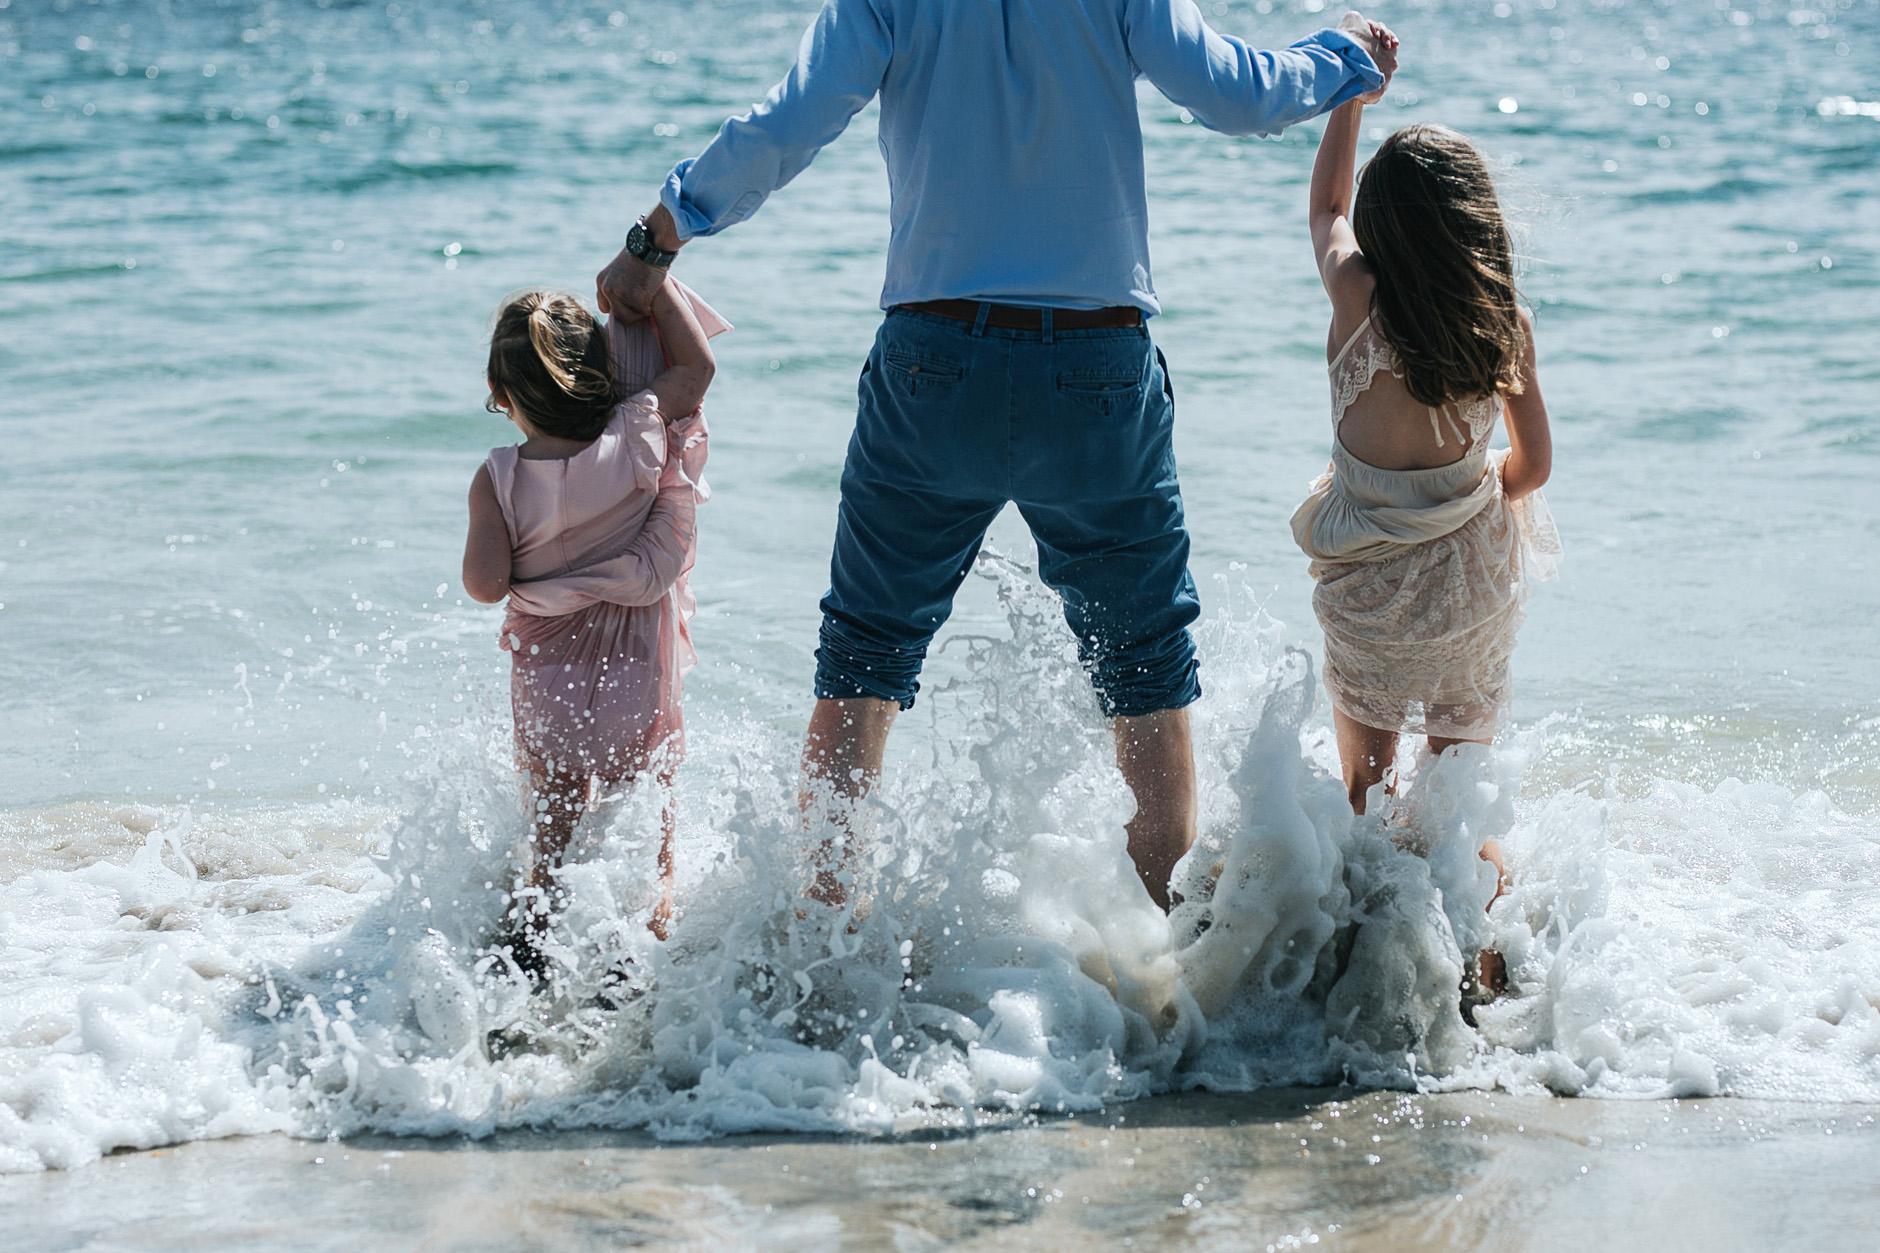 stunning-beach-family-vacation-photoshoot-achill-island-ireland-0011.jpg